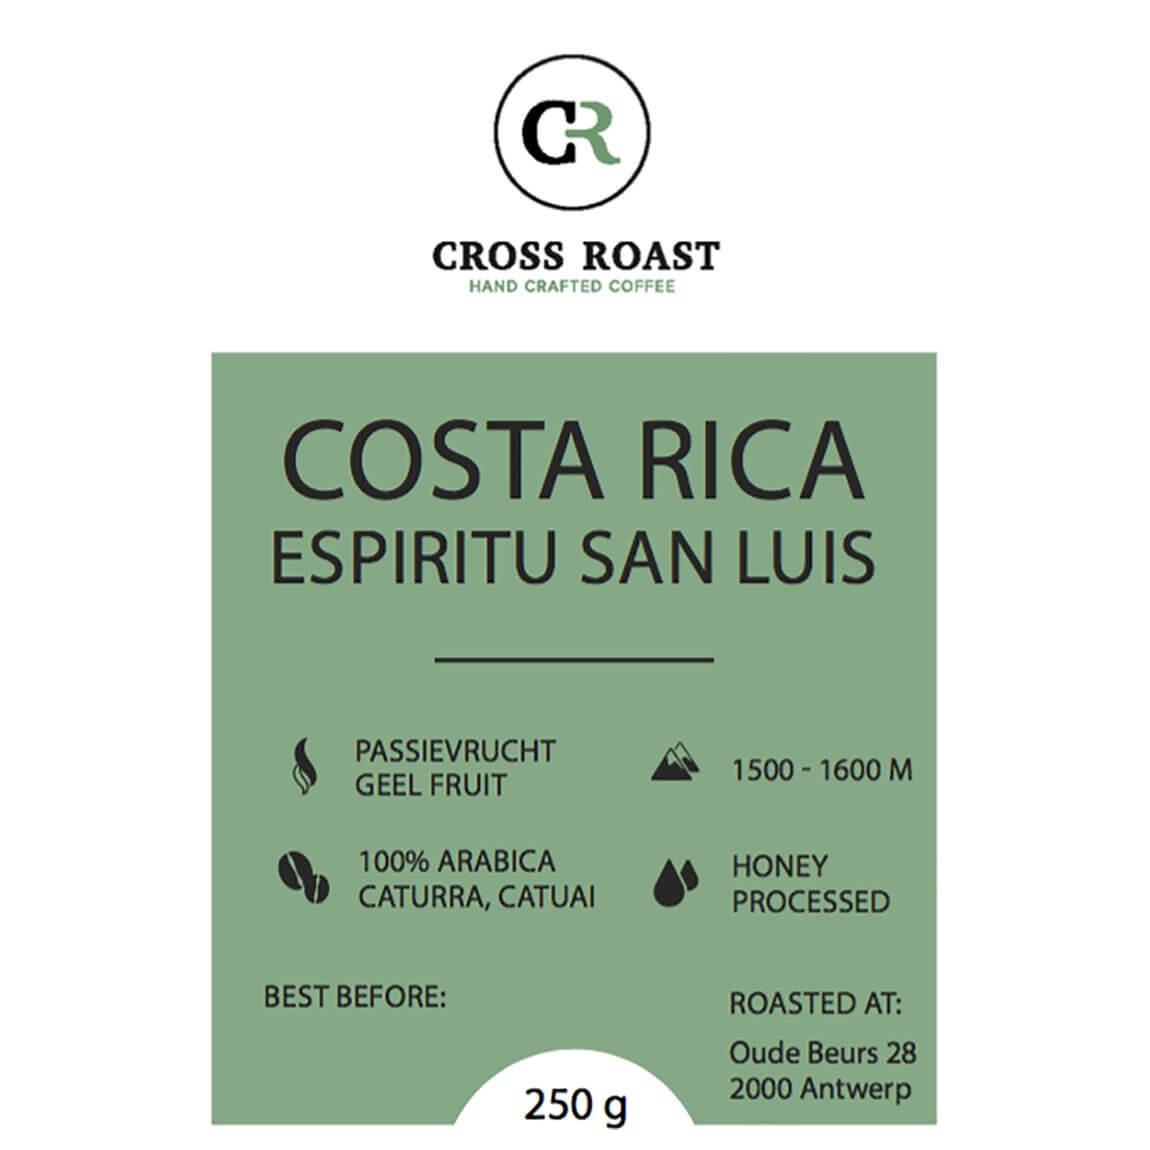 Costa Rica koffiebonen - Mandarijn   Donkere Chocolade - Cross Roast 40b3d13f824